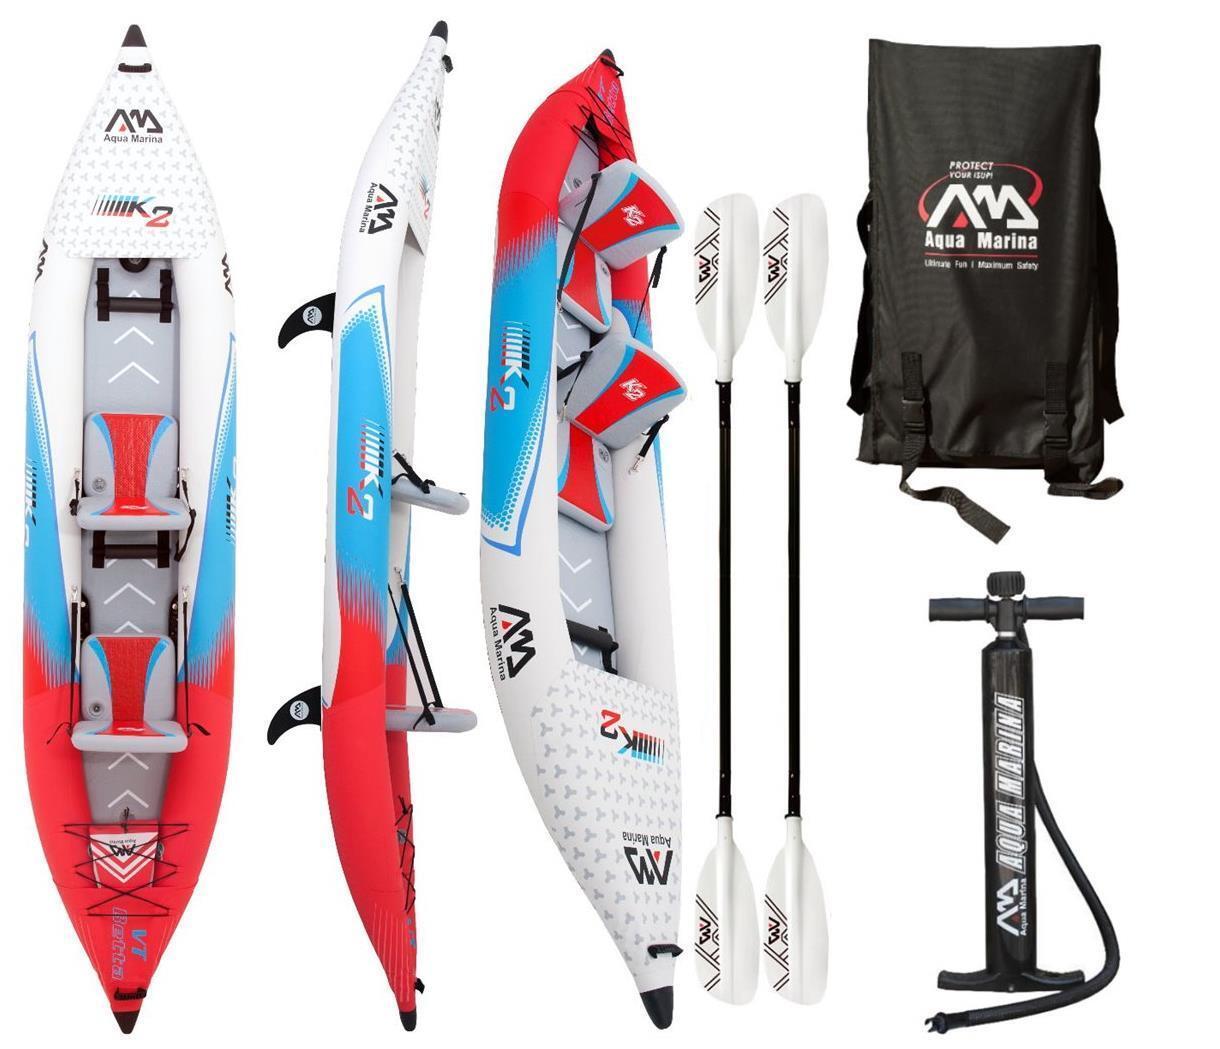 Aqua Marina Betta 13,6  Profesional Kajak 2 Personas Kayak Tours con 2 Remos